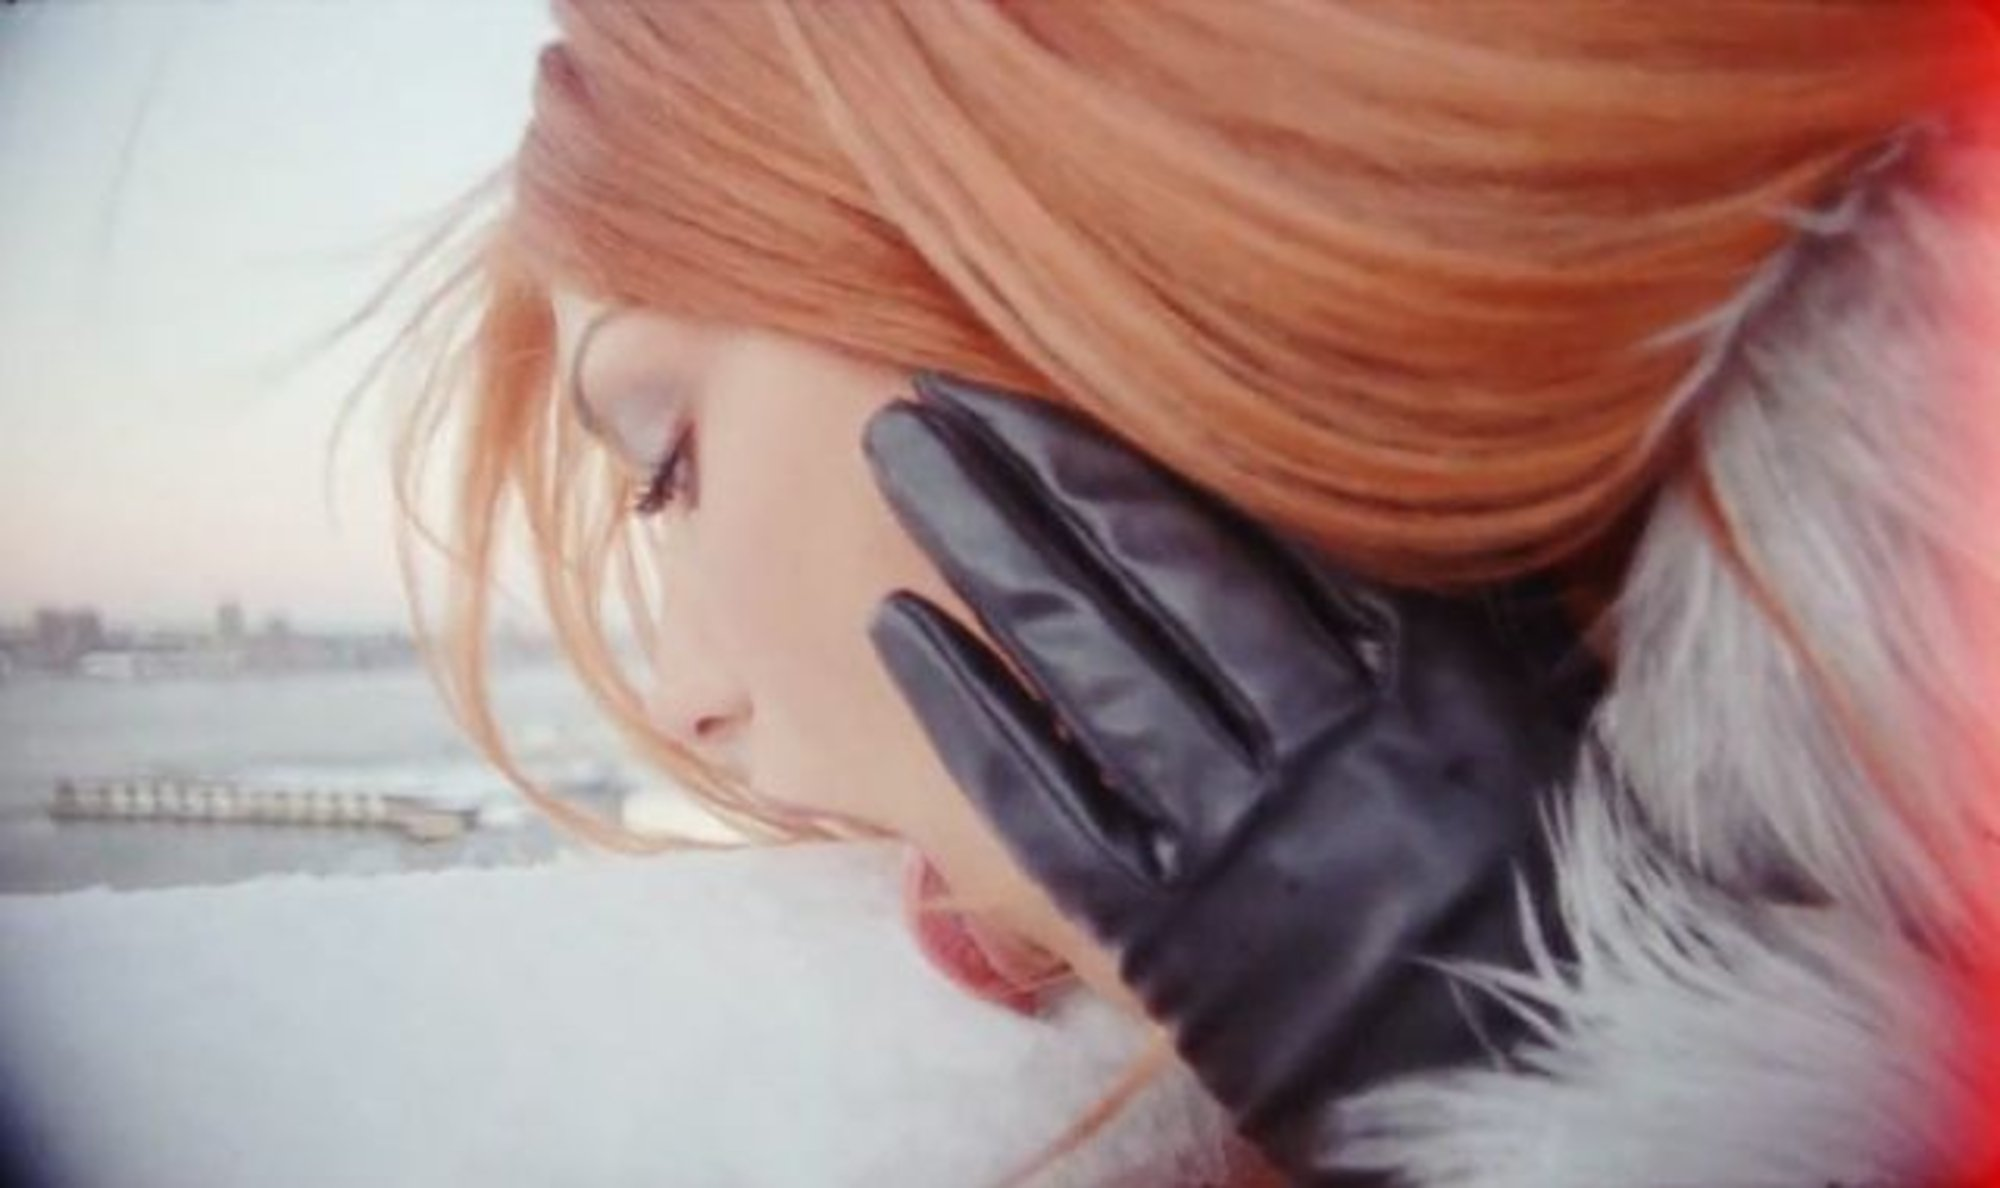 1609166821 281 Bella Hadid Licks New York Snow As A Redhead